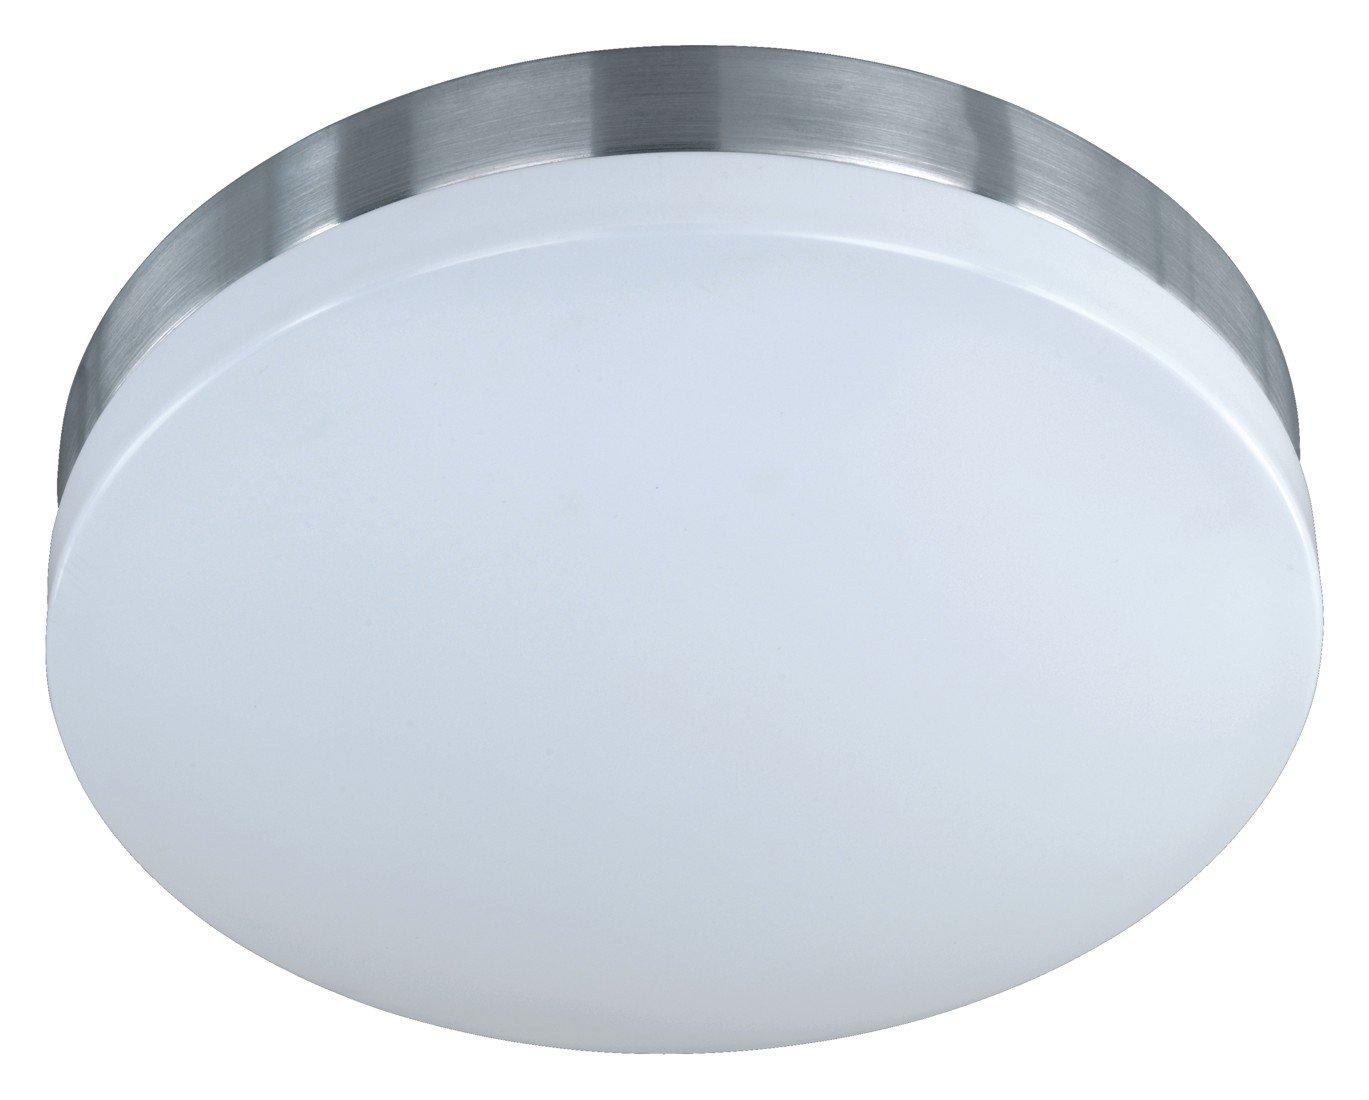 Trio Leuchten LED LED LED Deckenleuchte in Aluminium, inklusiv 1x18W LED 3100K 1620 Lumen , ø 36 cm, Höhe  11 cm, acryl weiß 625311805 6f0882